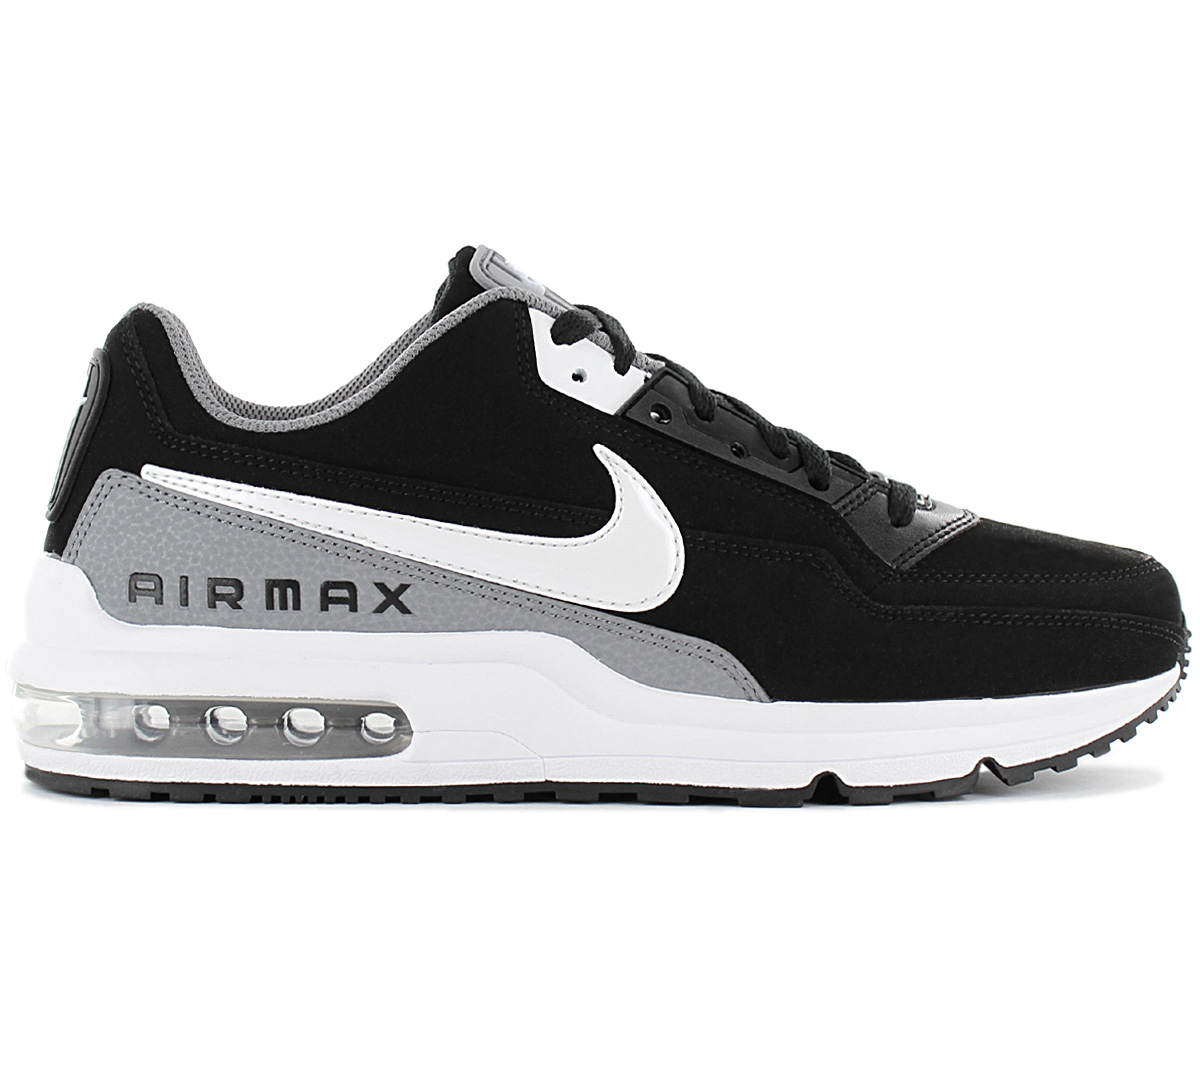 Details about Nike air max Ltd 3 Men's Sneaker BV1171 001 Black Shoes Trainers Sports Shoes